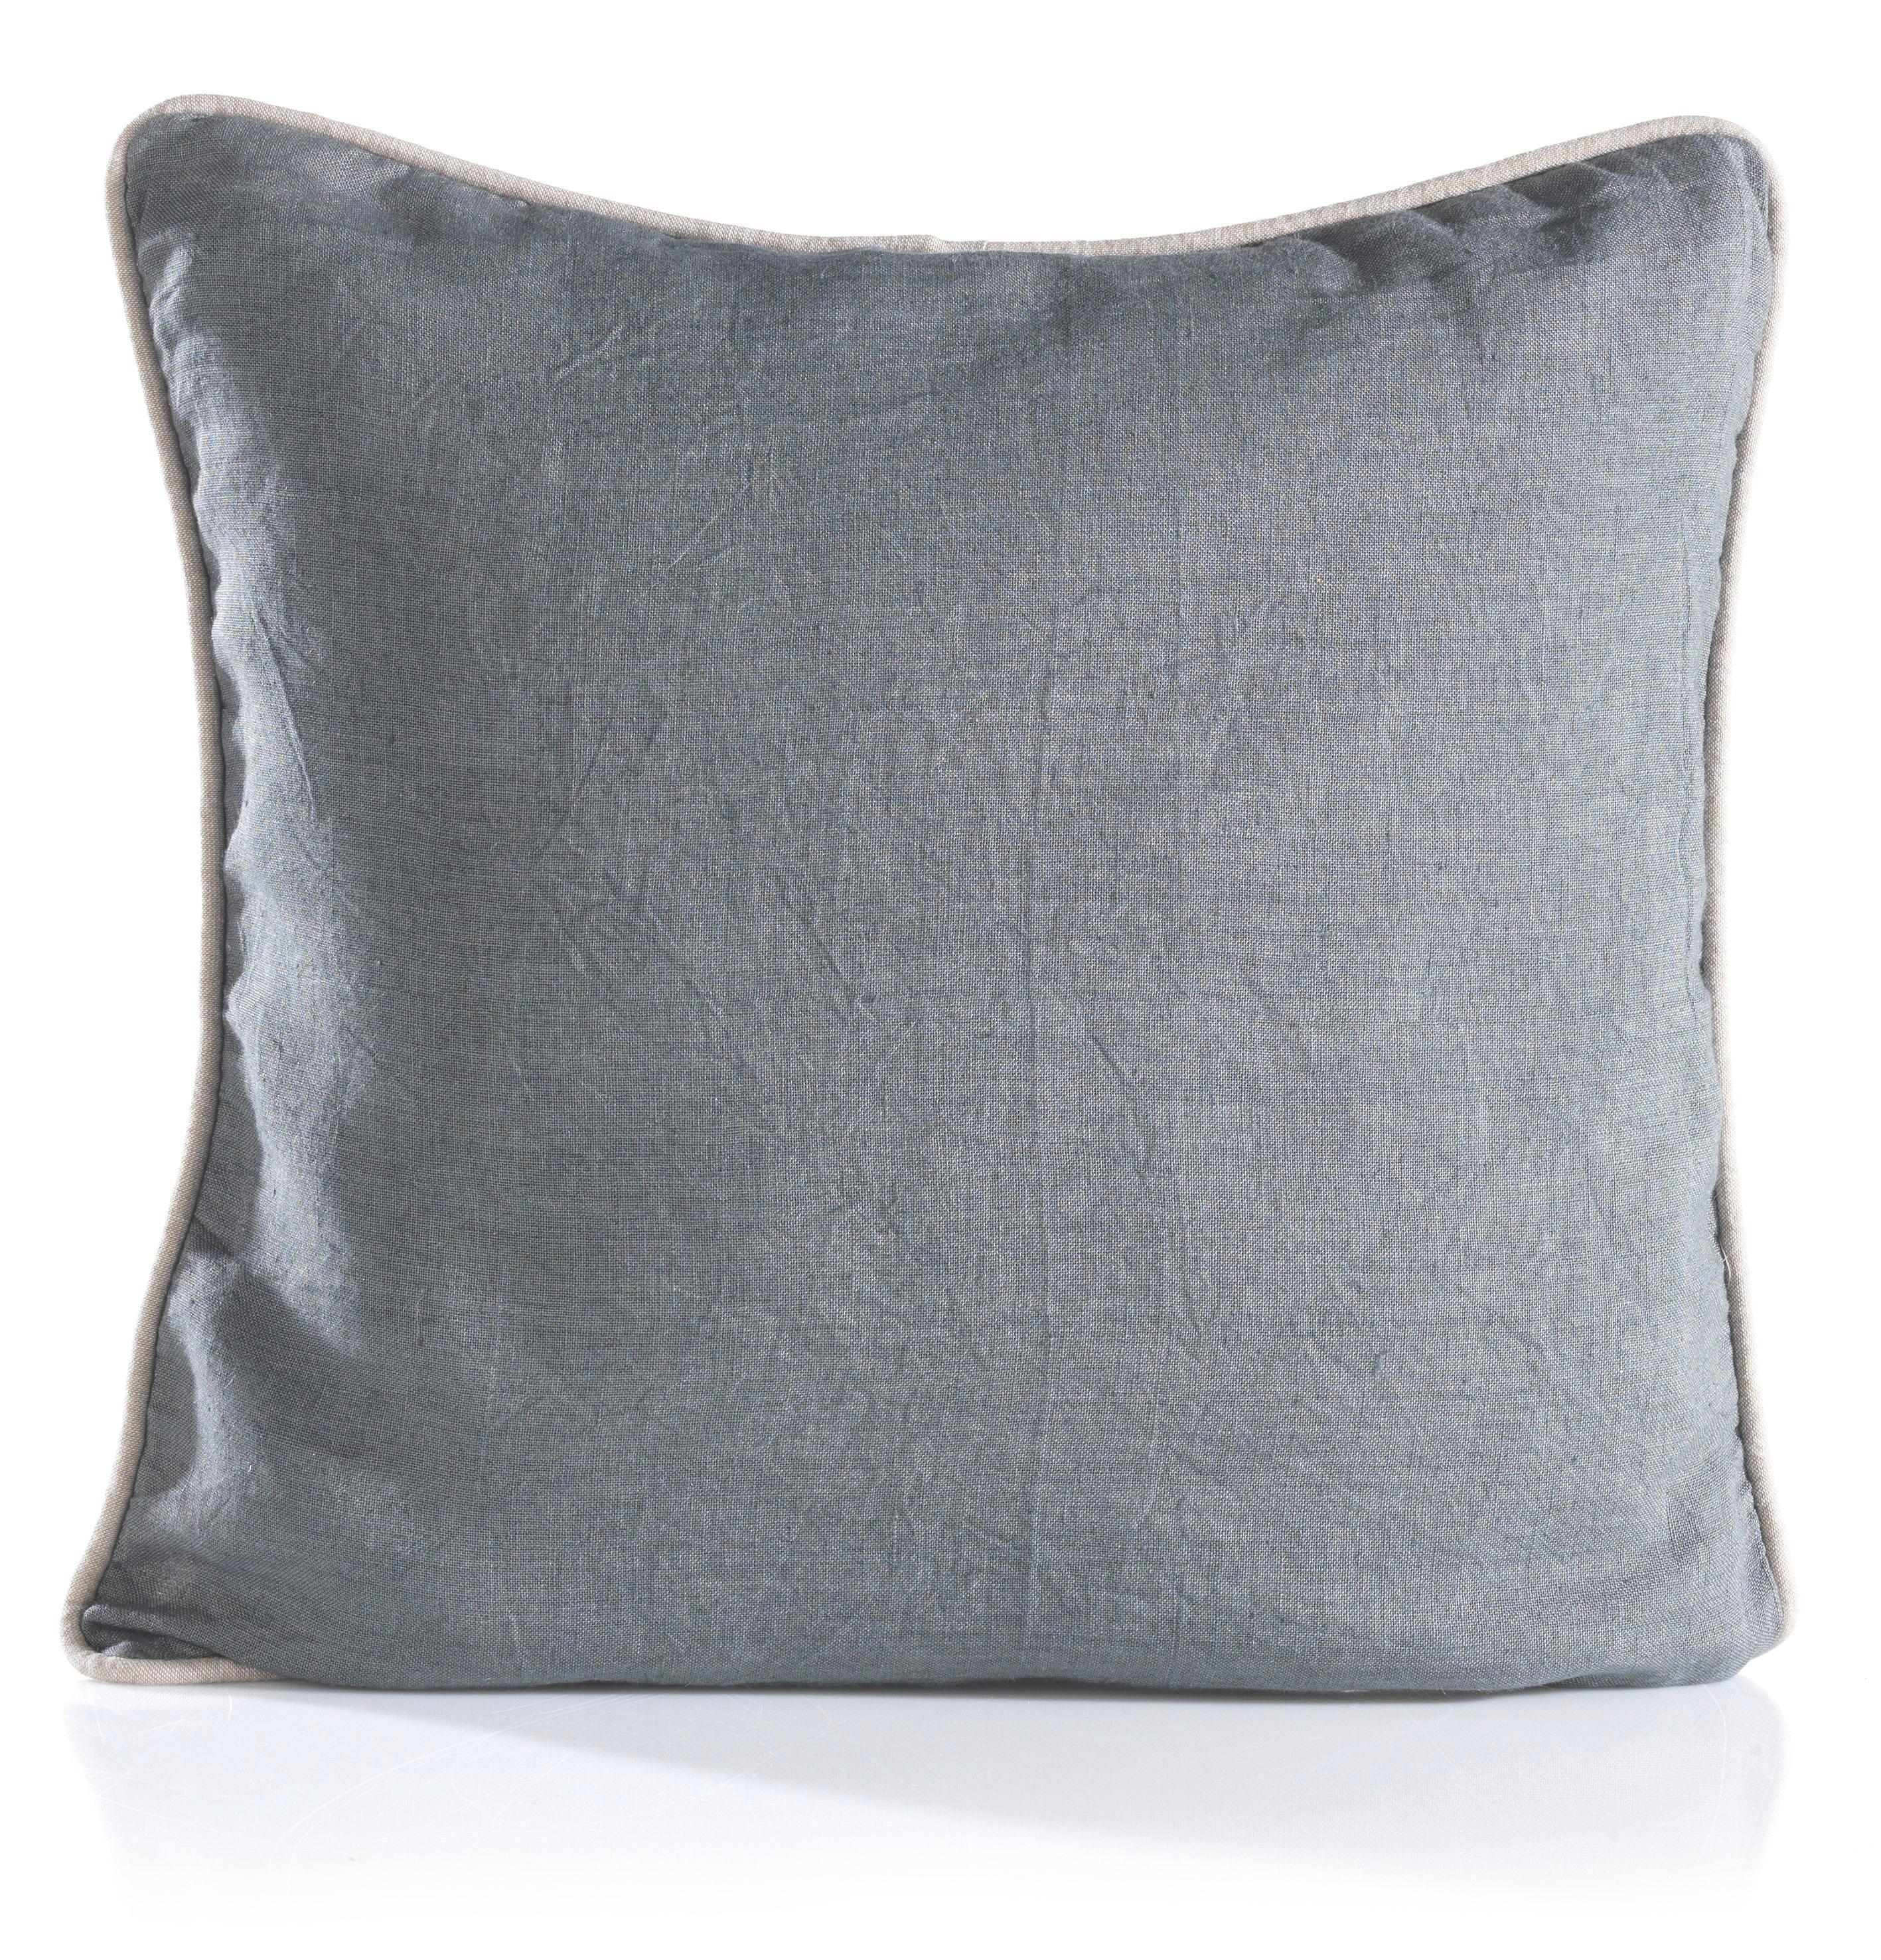 Zierkissen Stefan 40x40cm - Hellgrau/Grau, Textil (40/40cm) - MÖMAX modern living